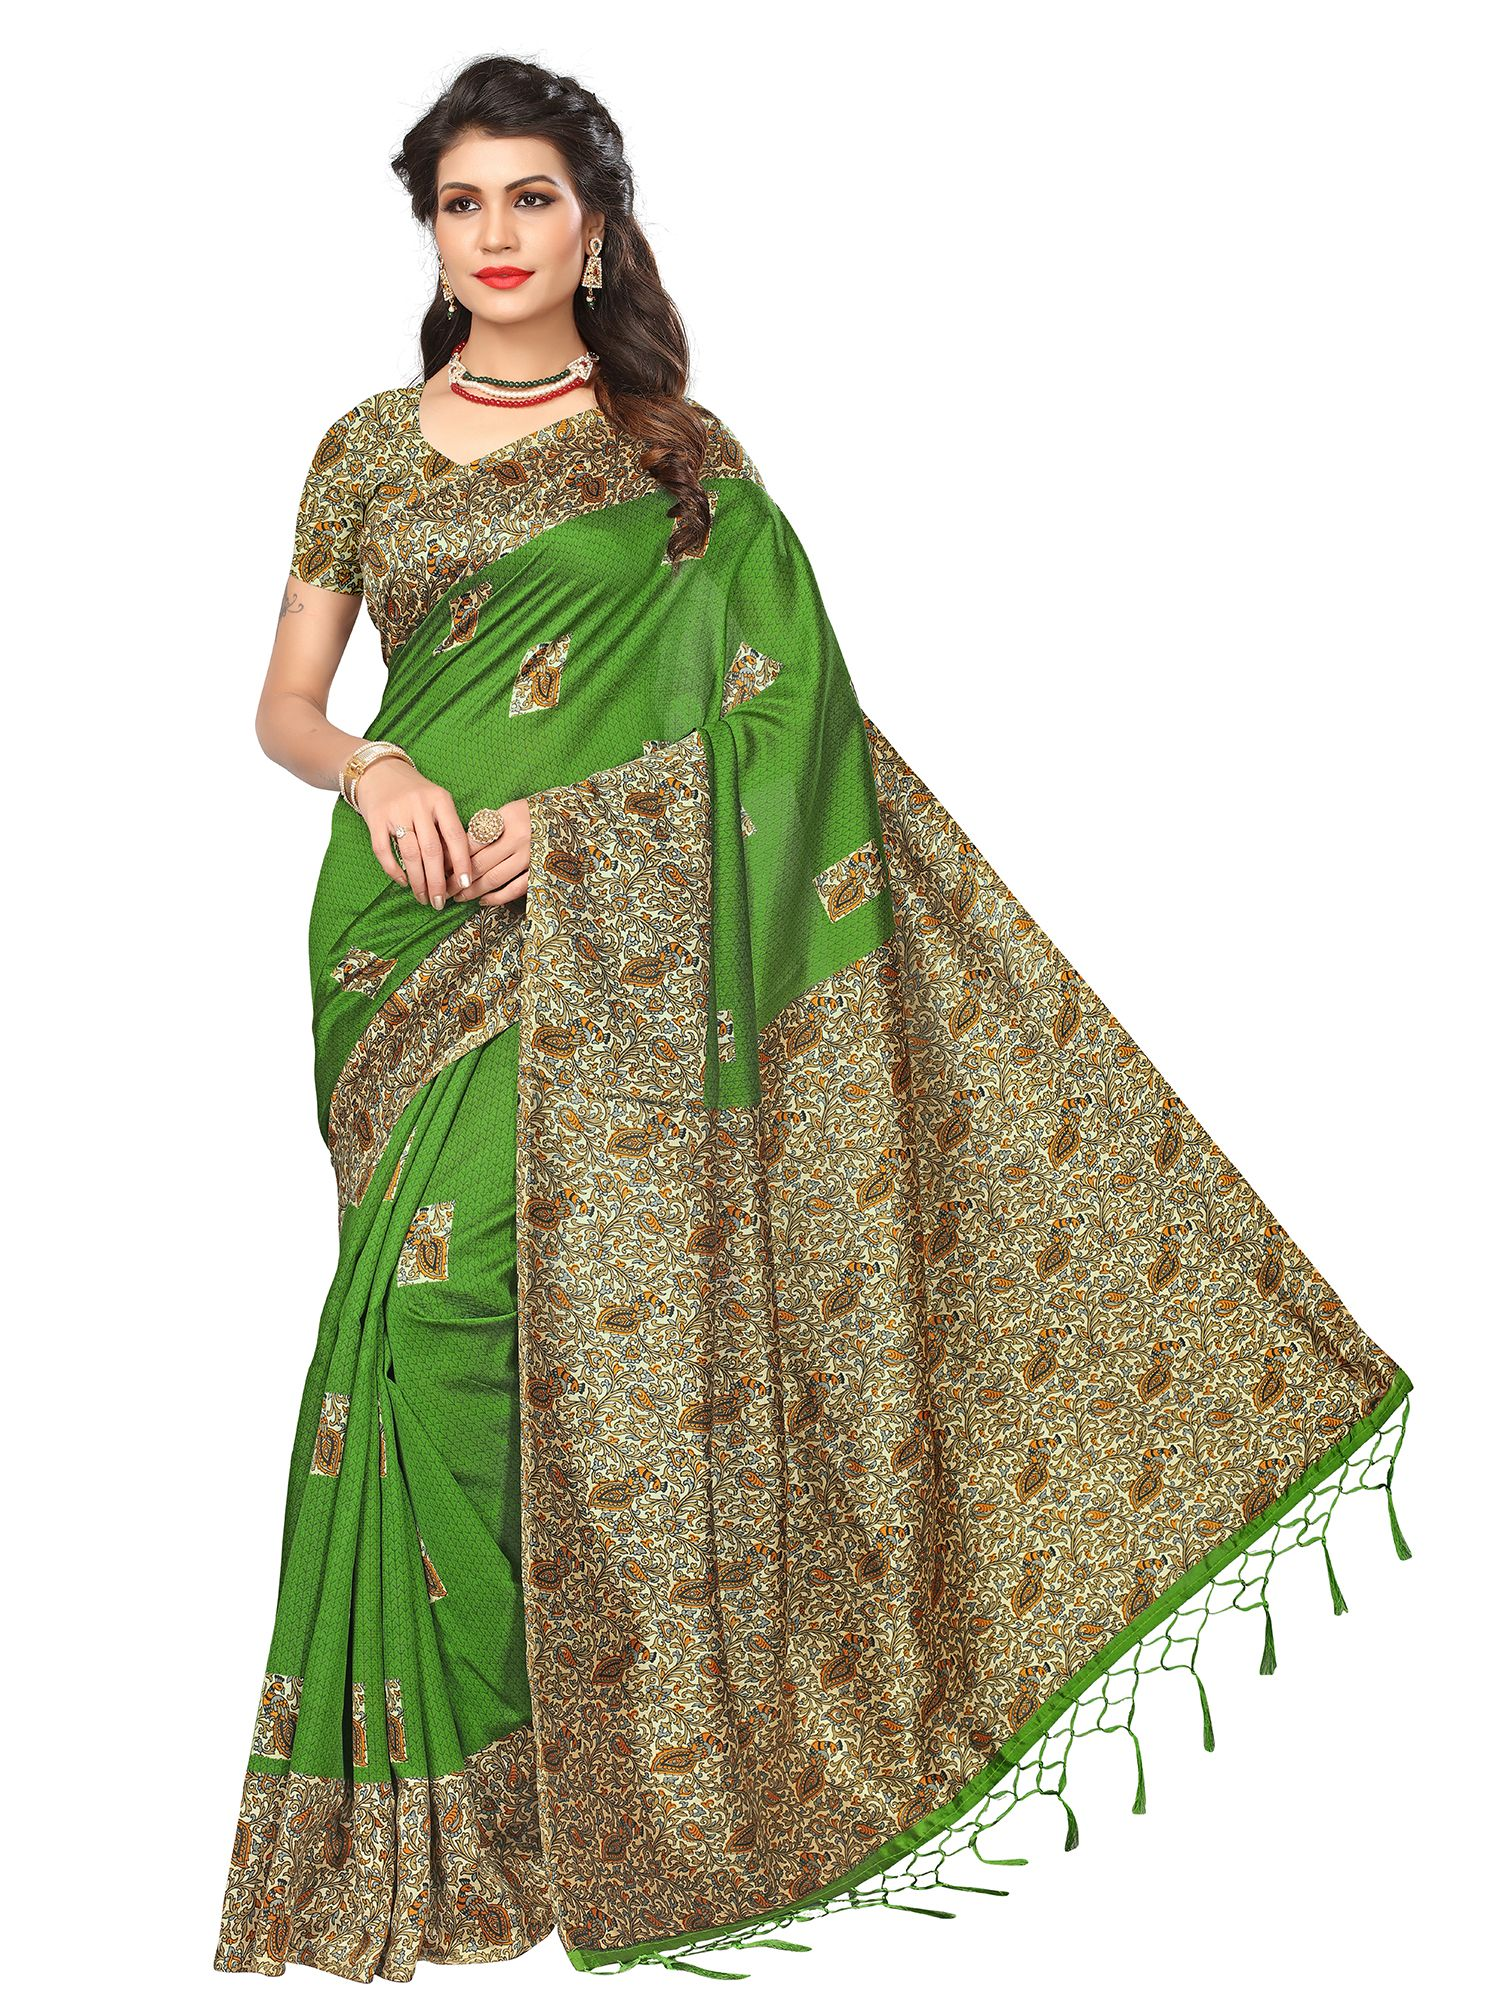 5486e747cede1c #sarees #green #silk #sari #blouse #flipkart #ratnavati #casualsarees #women